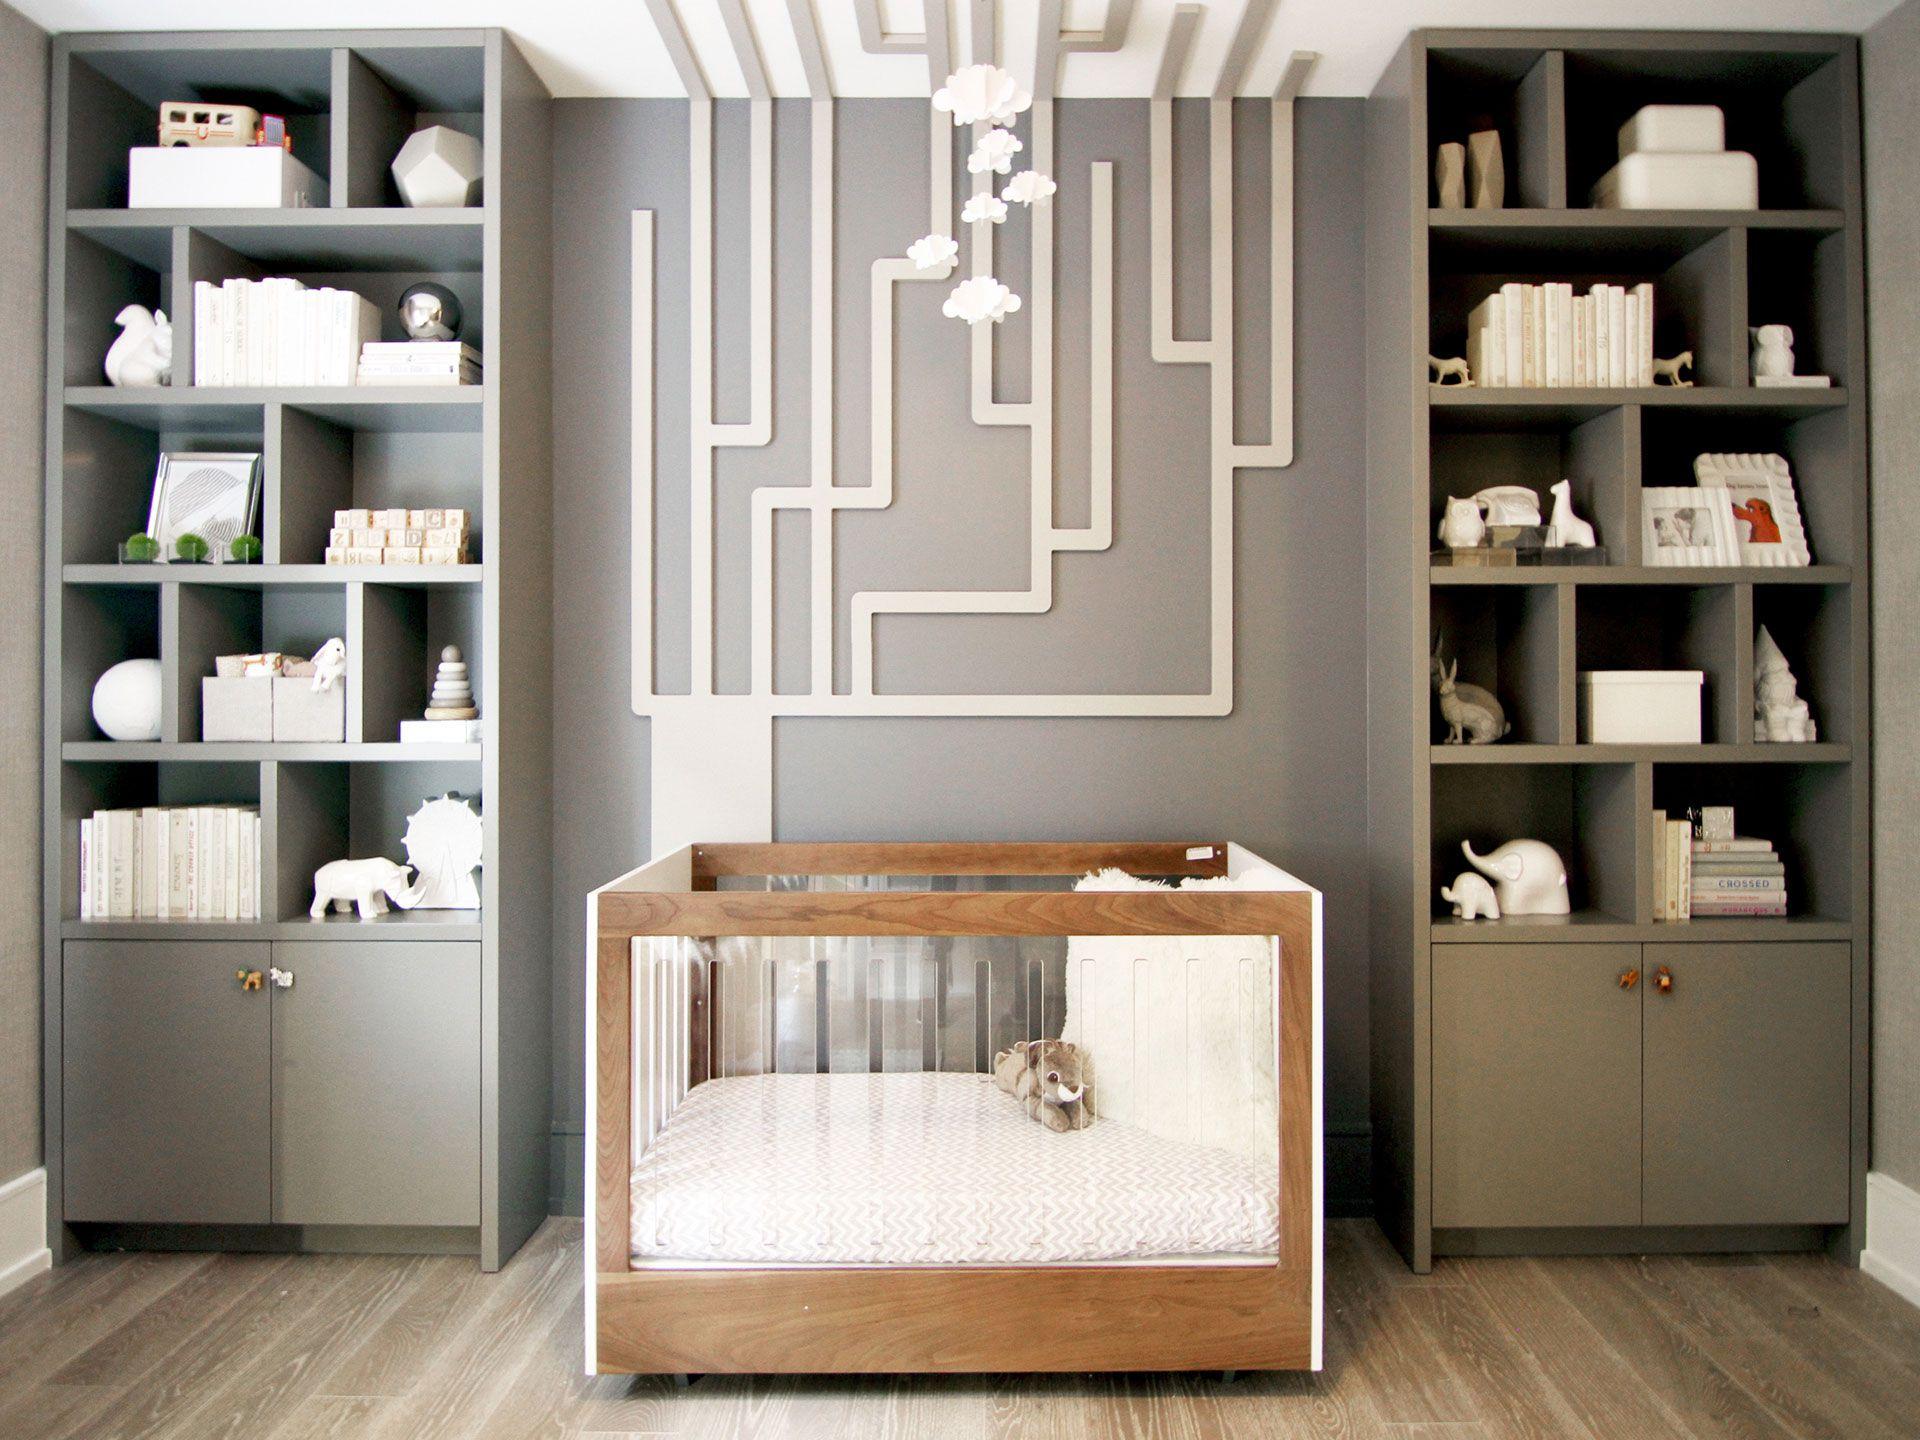 kings ridge modern residence tomas pearce interior design consulting inc